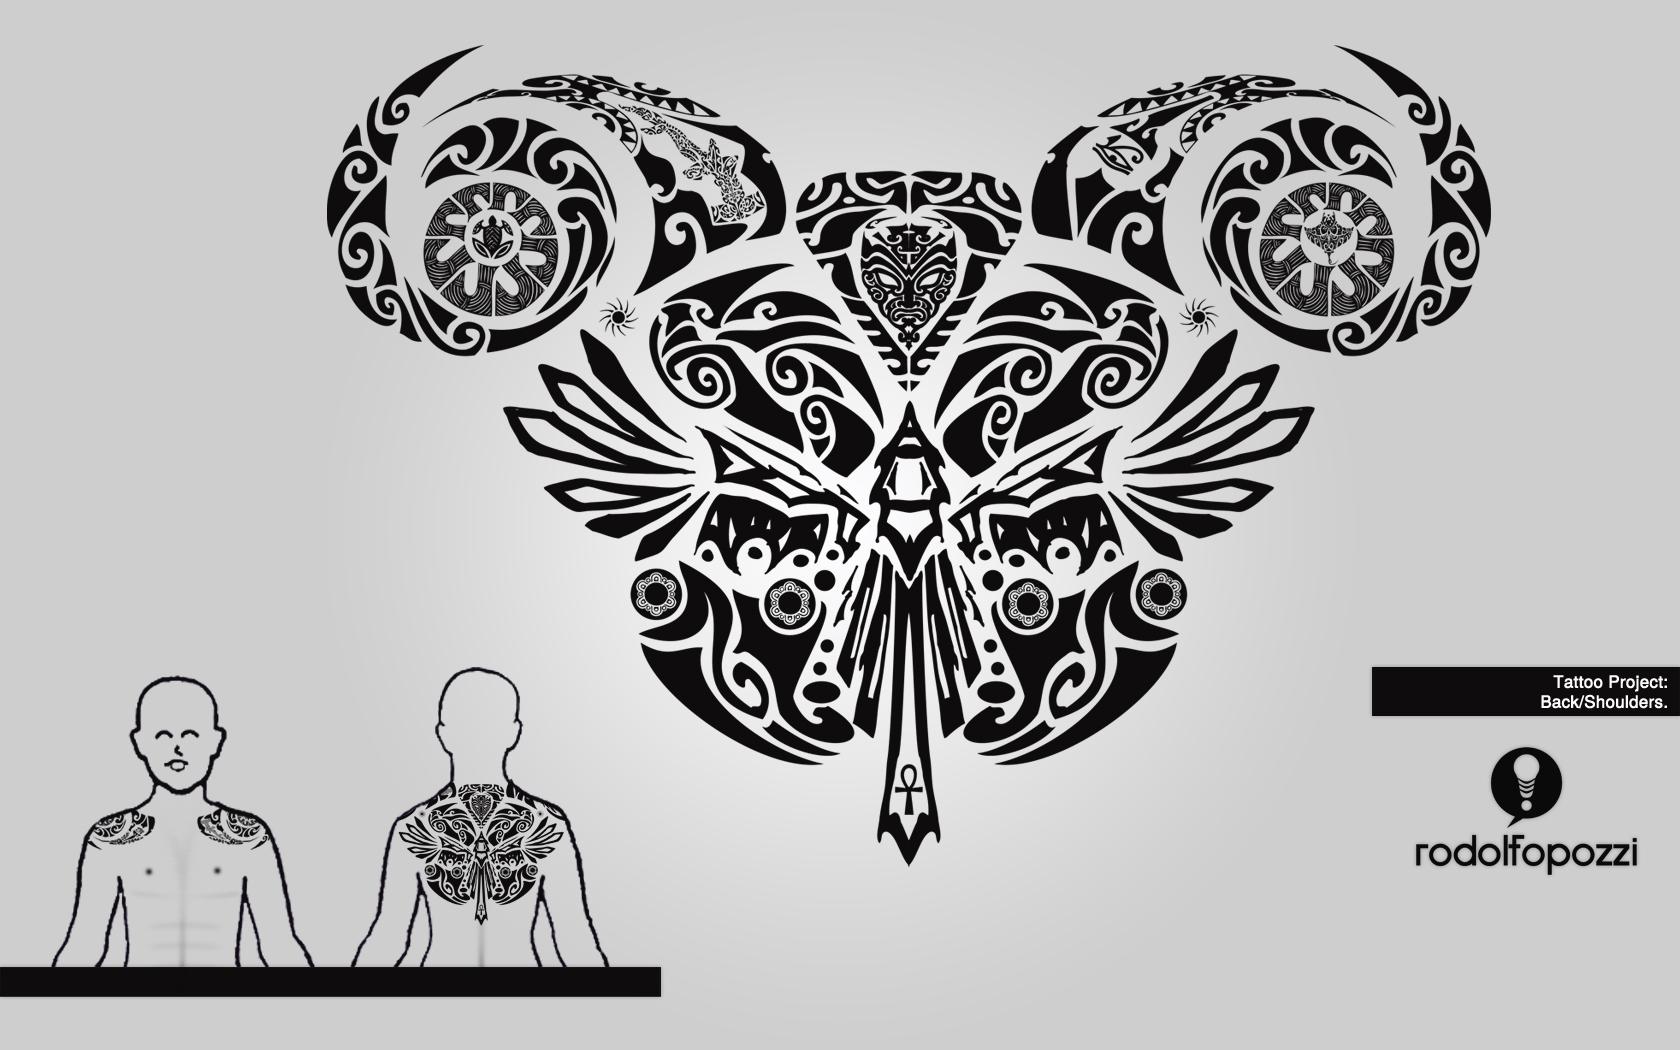 100 Desenhos Tribais Tattoo Maori Life By Rodolfopozzi D36avr1